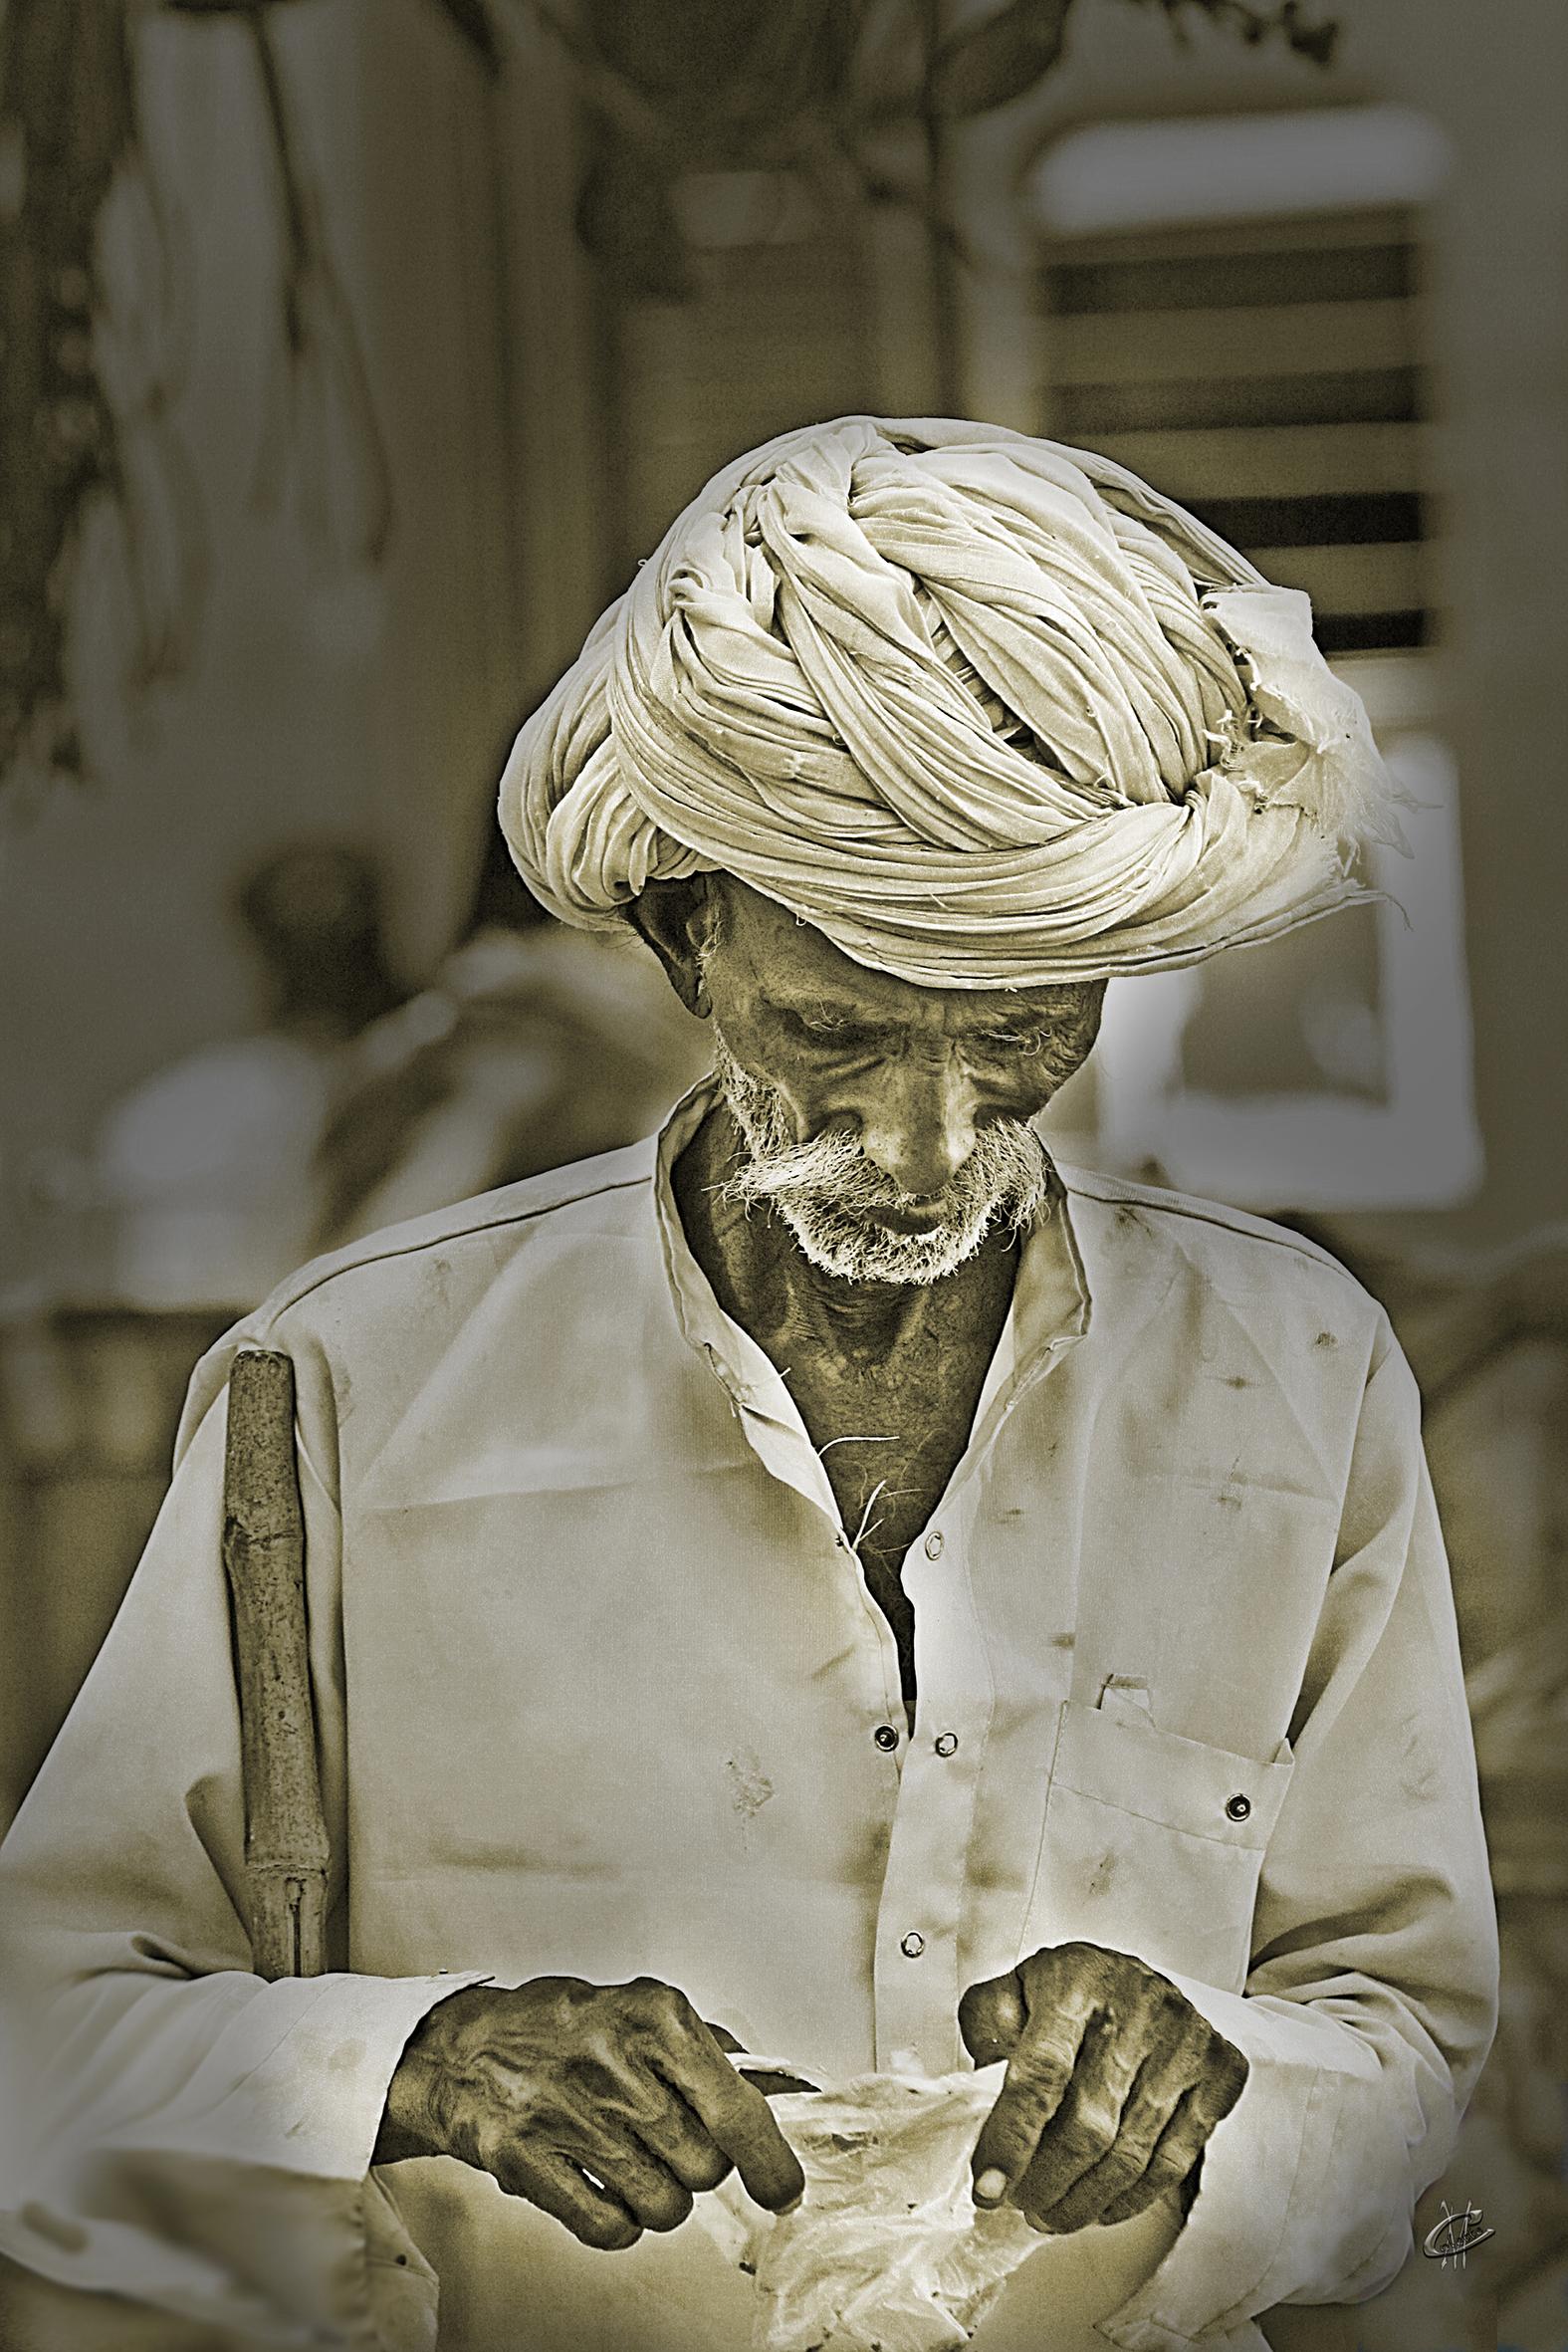 portraits-indien-inde-rajasthan-2010-marie-colette-becker-07